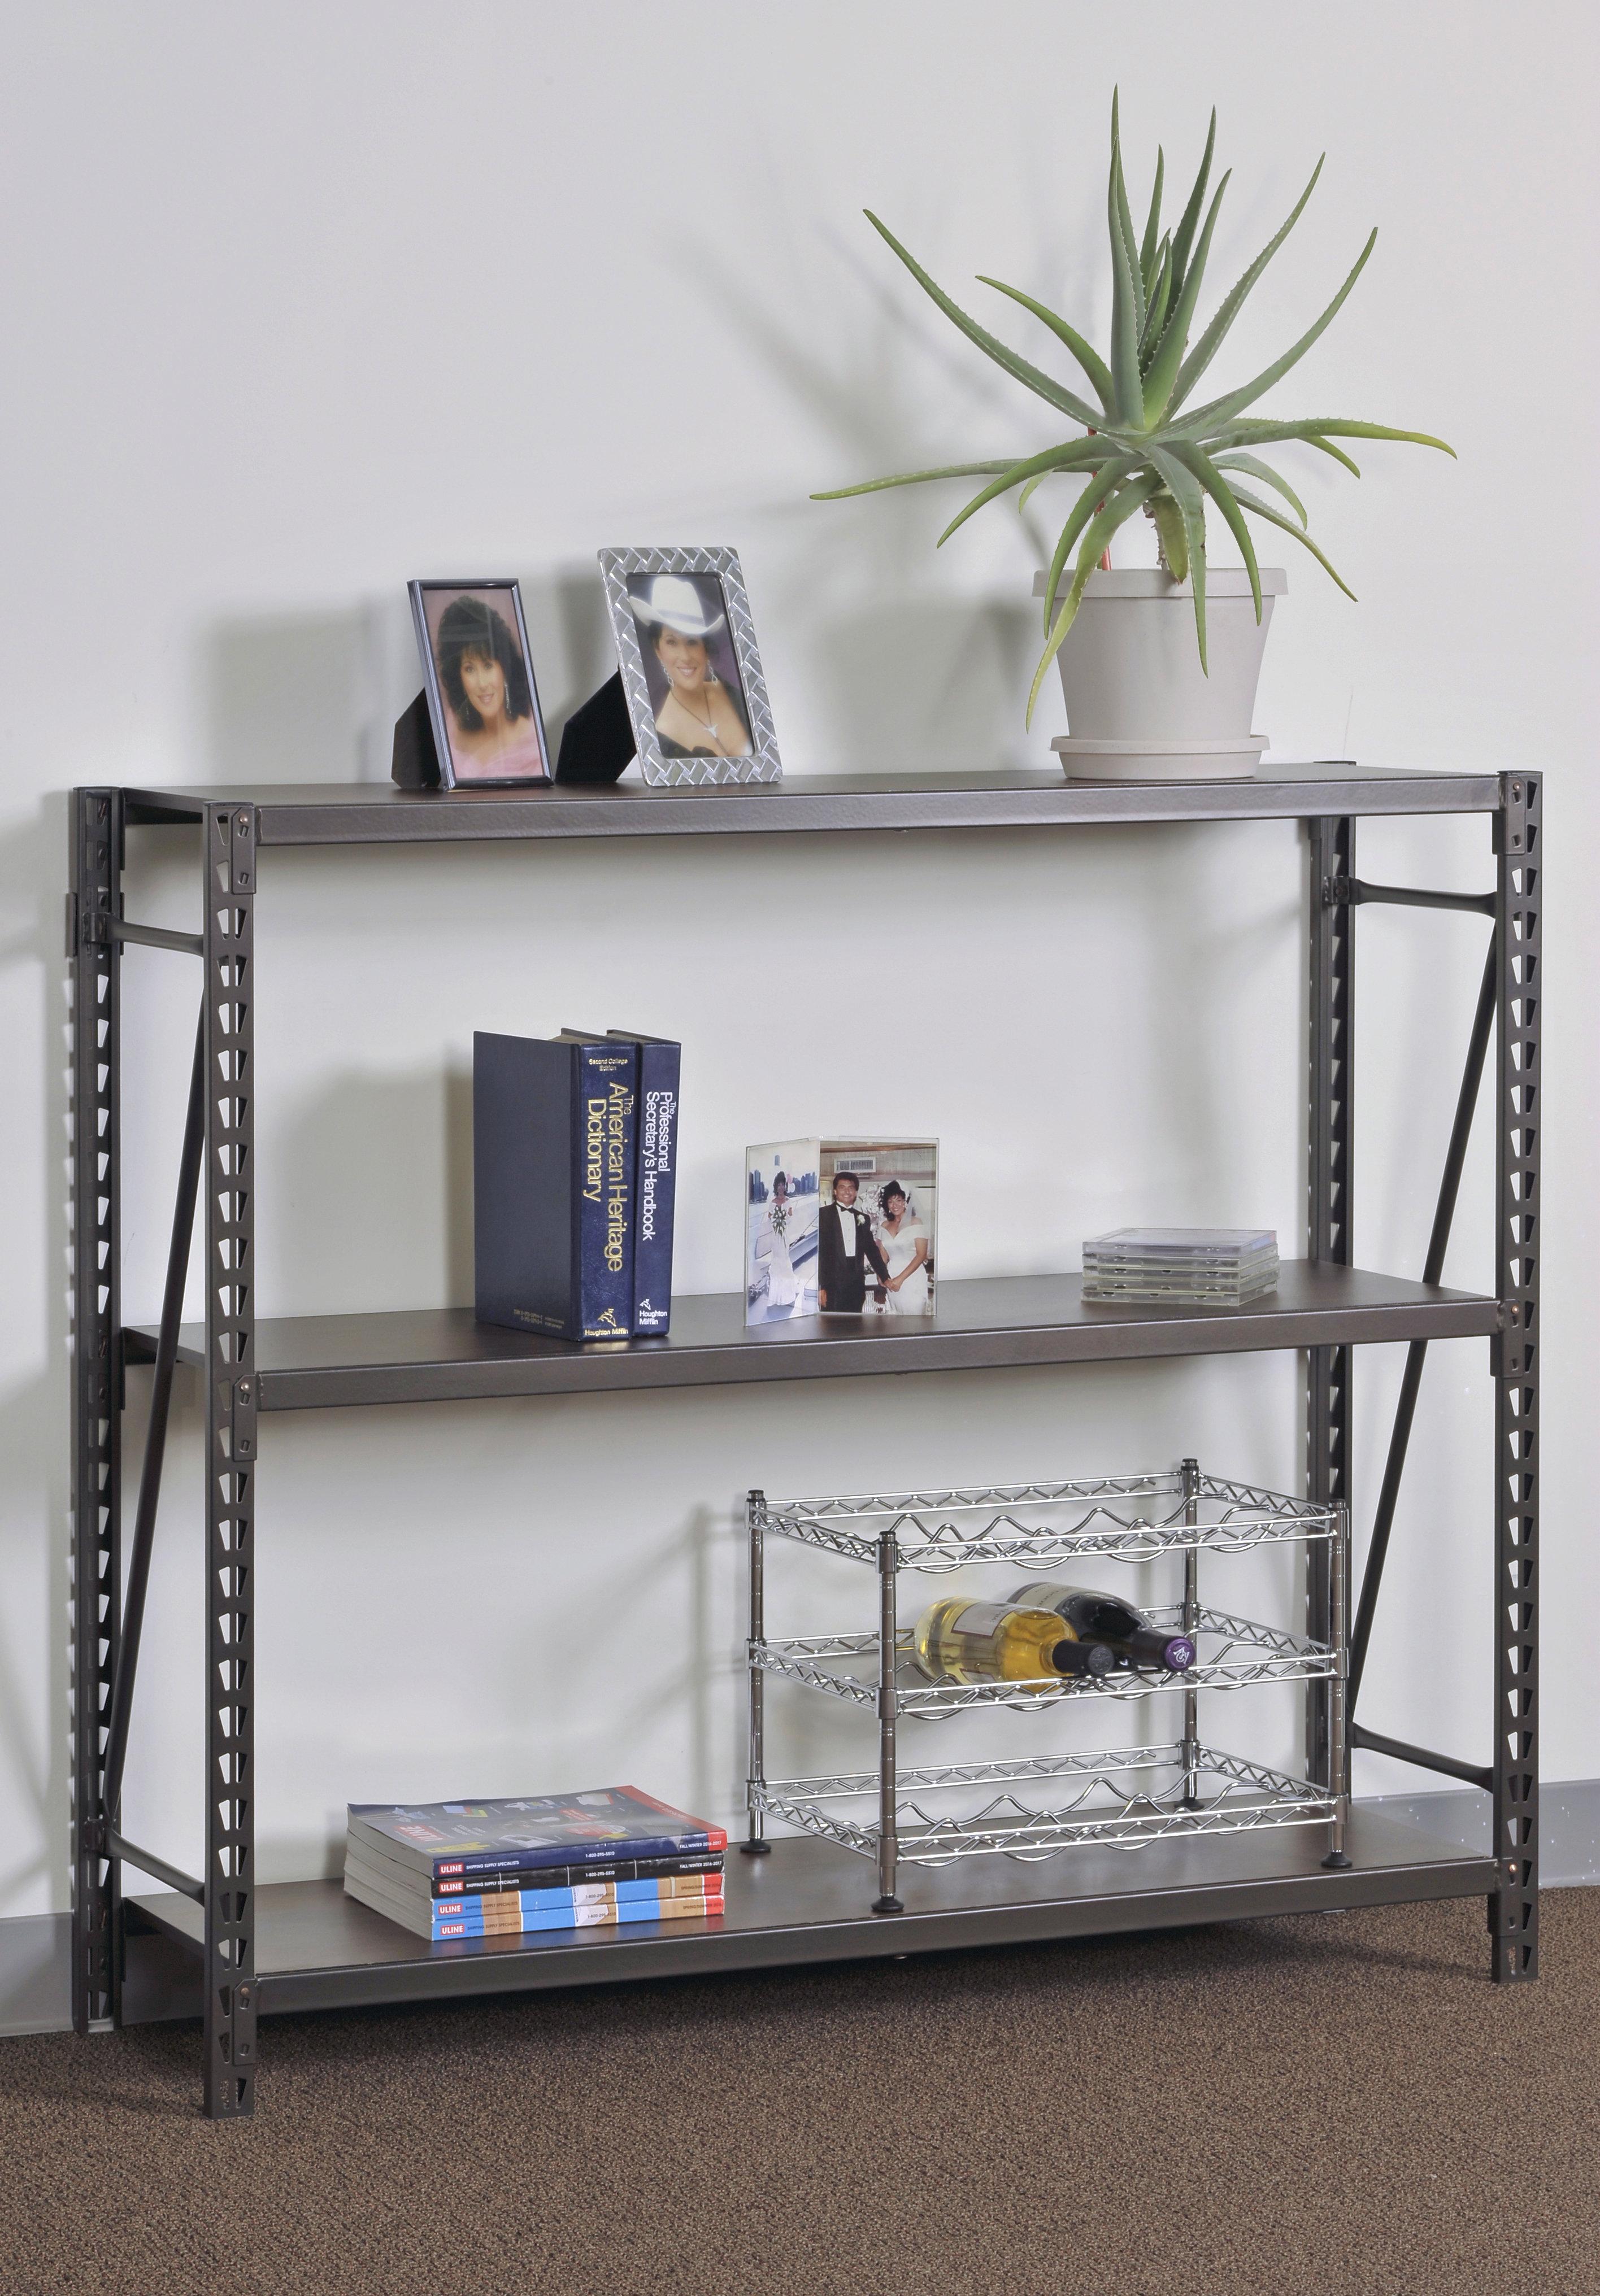 Decorative Shelves – more than pure shelves